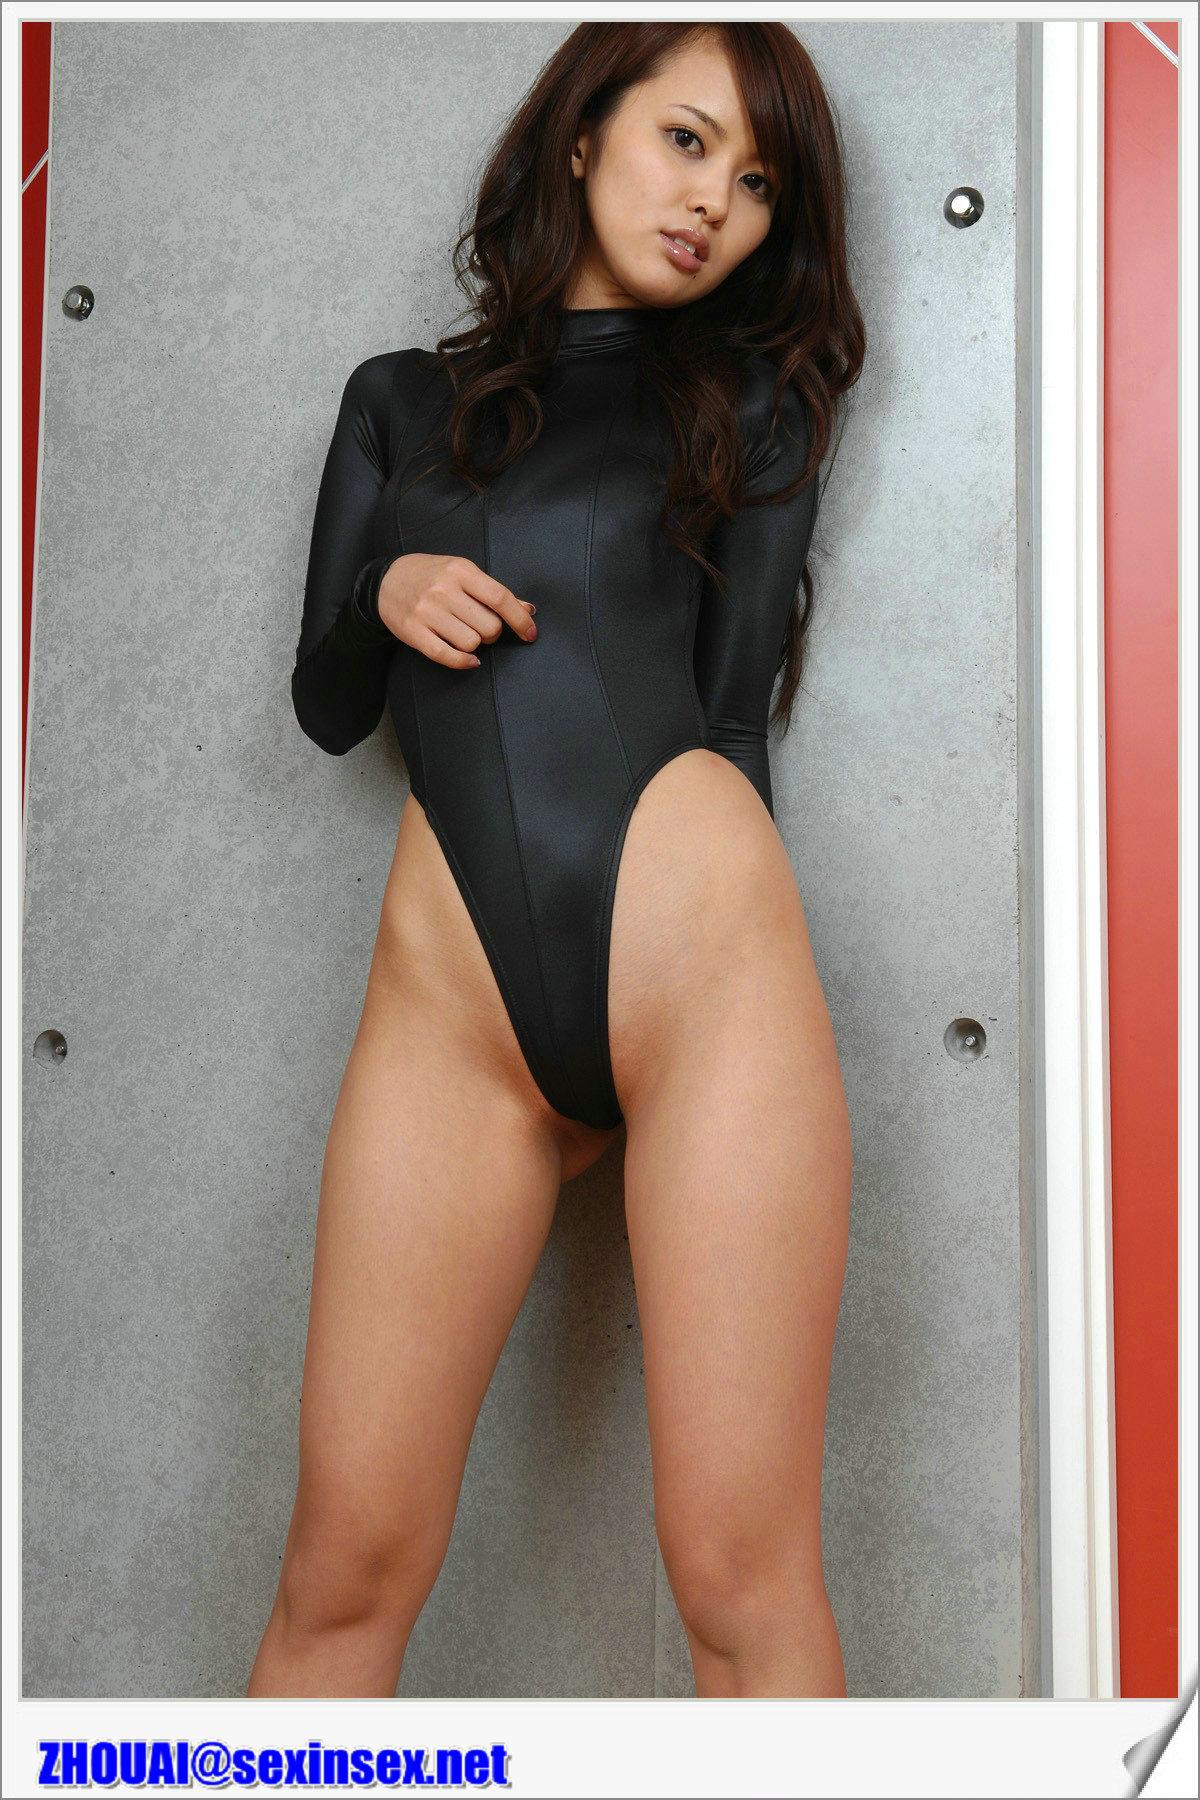 Японочка раздвигает ножки фото 16 фотография